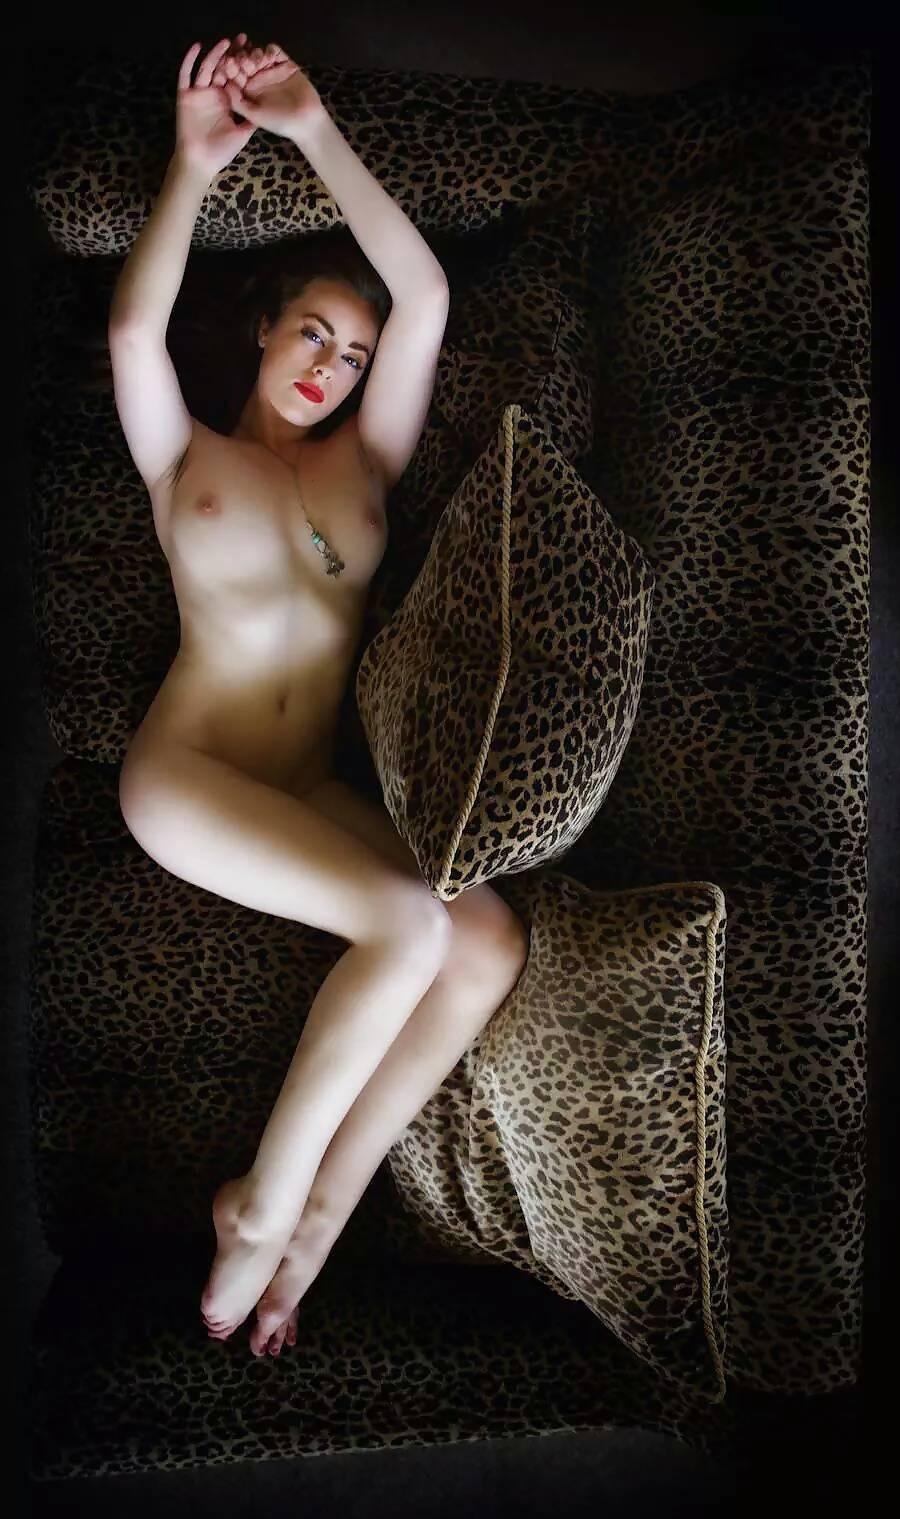 https://fitnakedgirls.com/wp-content/uploads/2020/03/FitNakedGirls.com-Rosa-Brighid-nude-17.jpg